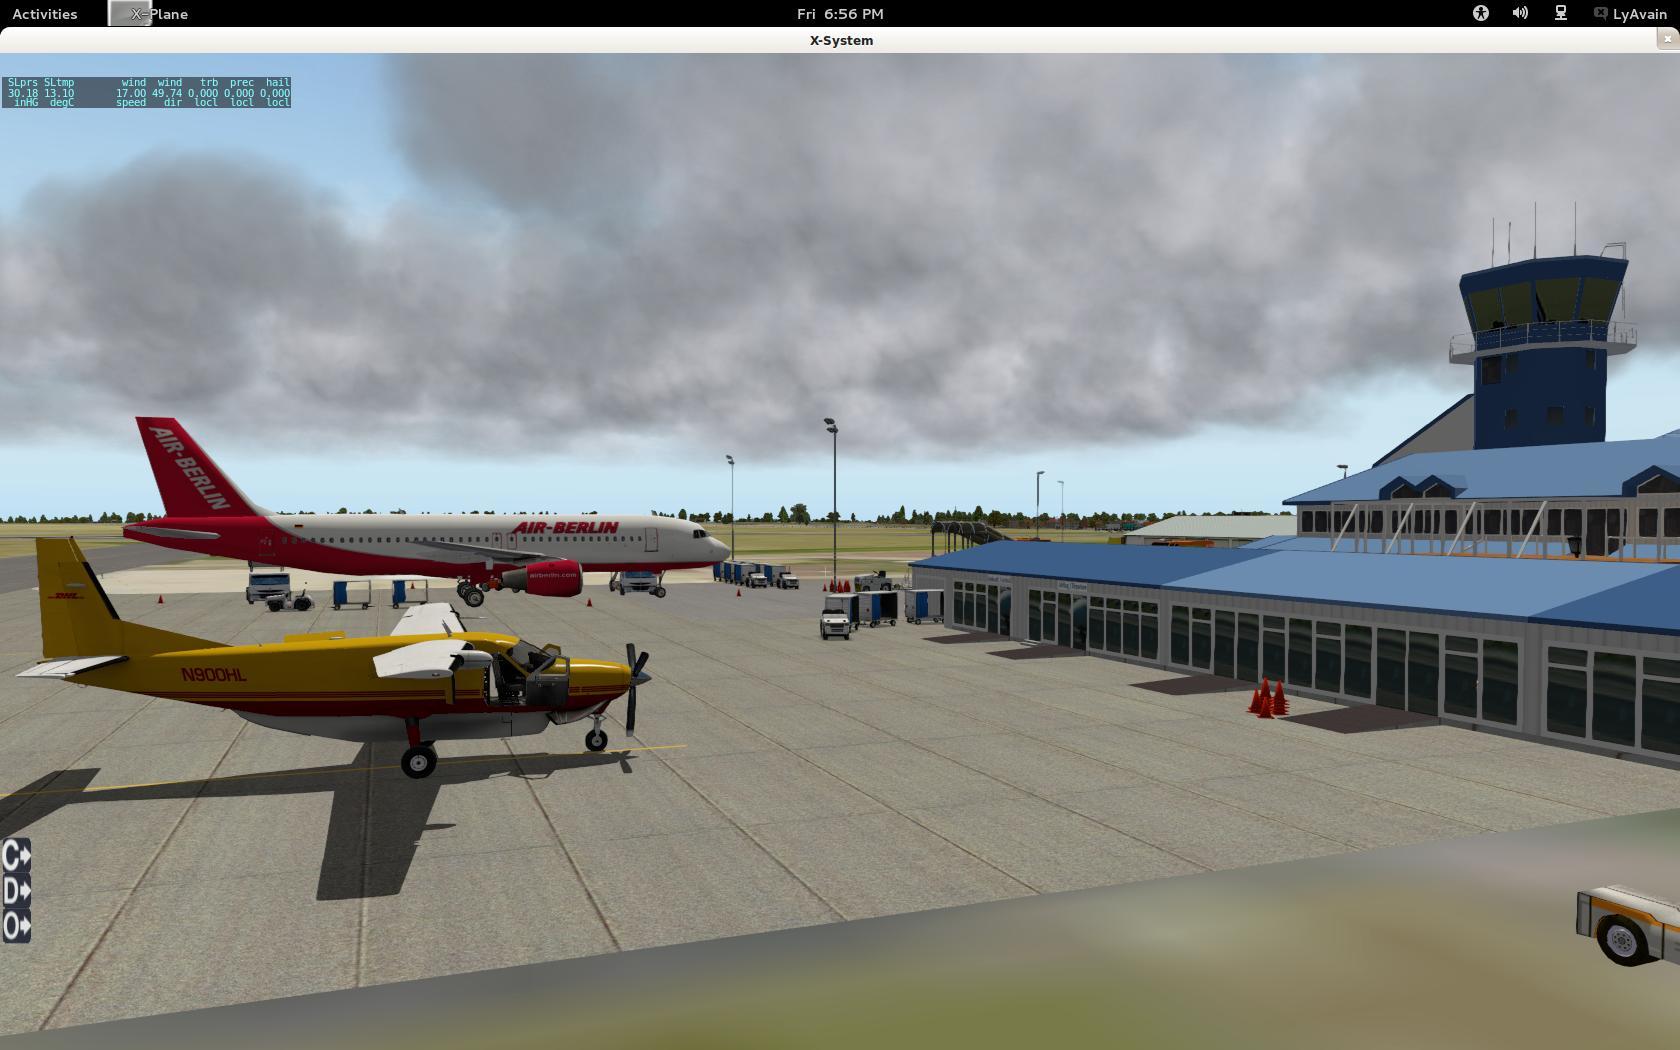 screenshotfrom2013-10z0zwb.jpg